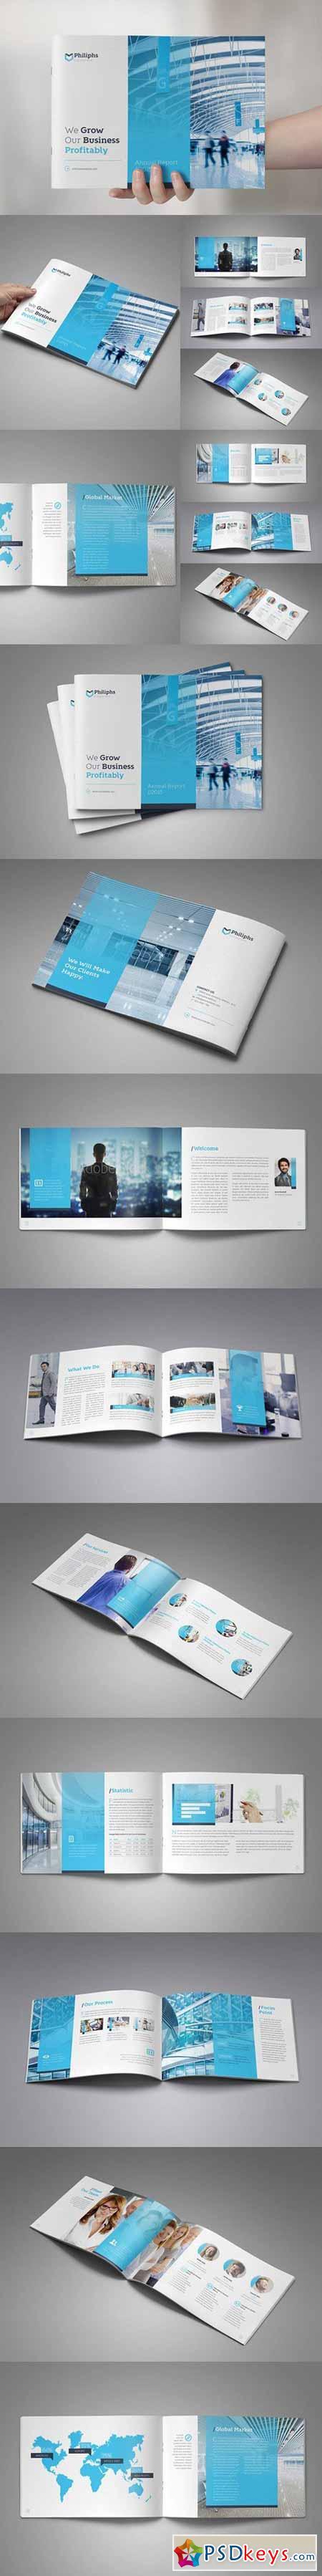 horizontal brochure template